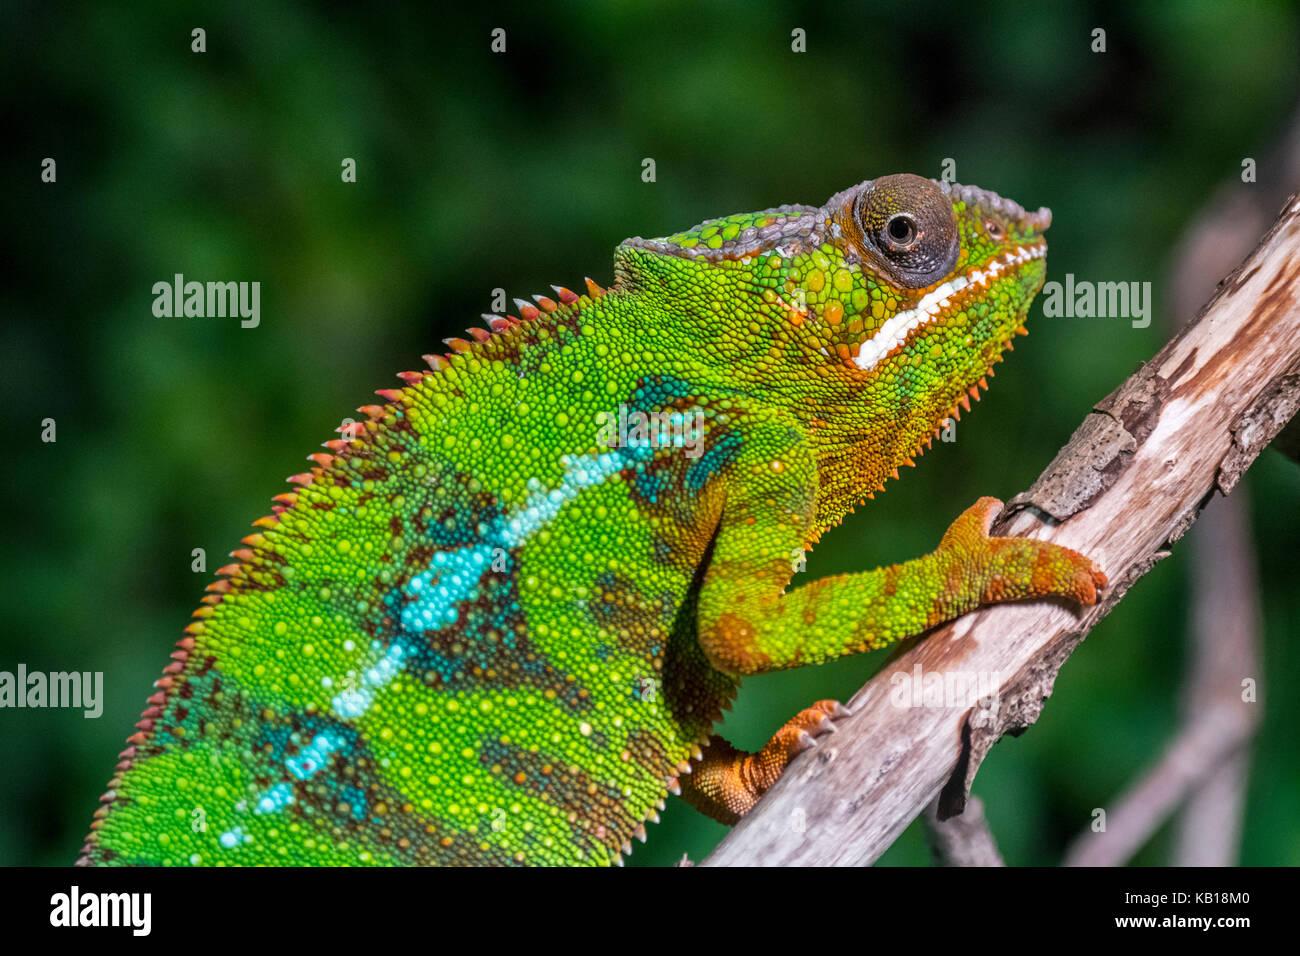 Panther chameleon (Furcifer pardalis) in tree, native to  Madagascar - Stock Image